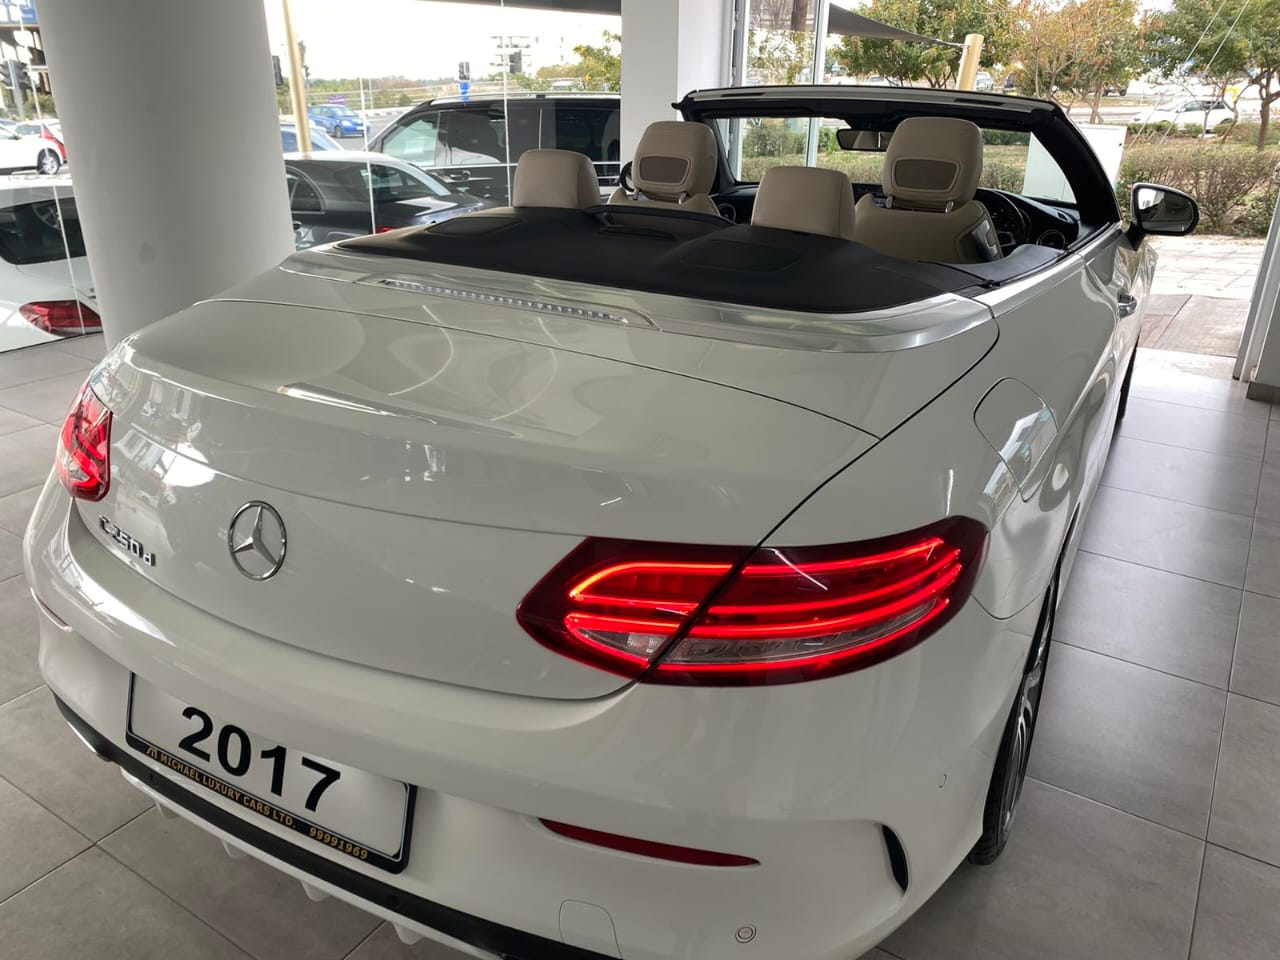 Mercedes C250d Cabriolet AMG